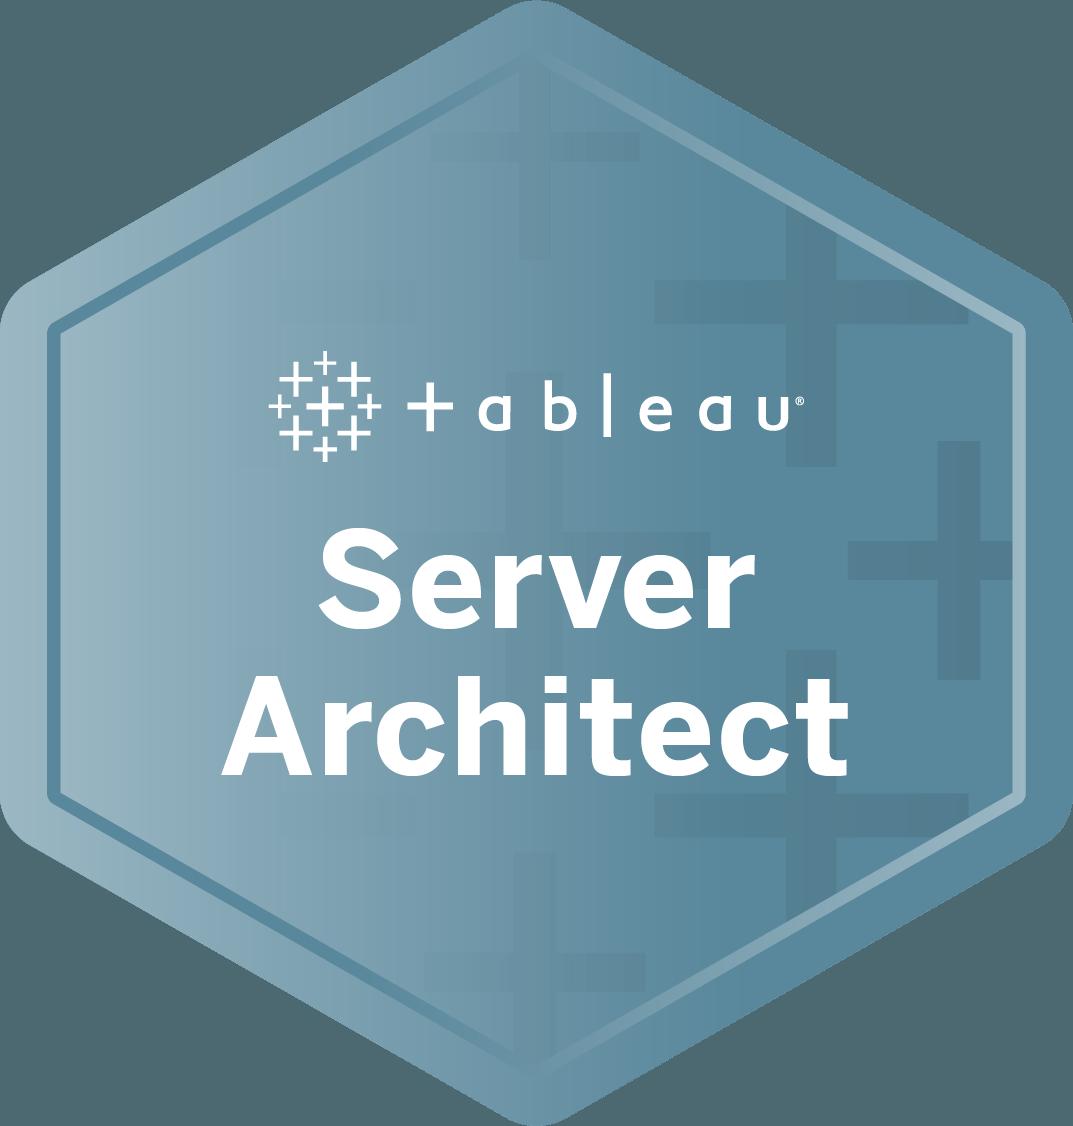 Server Architect badge